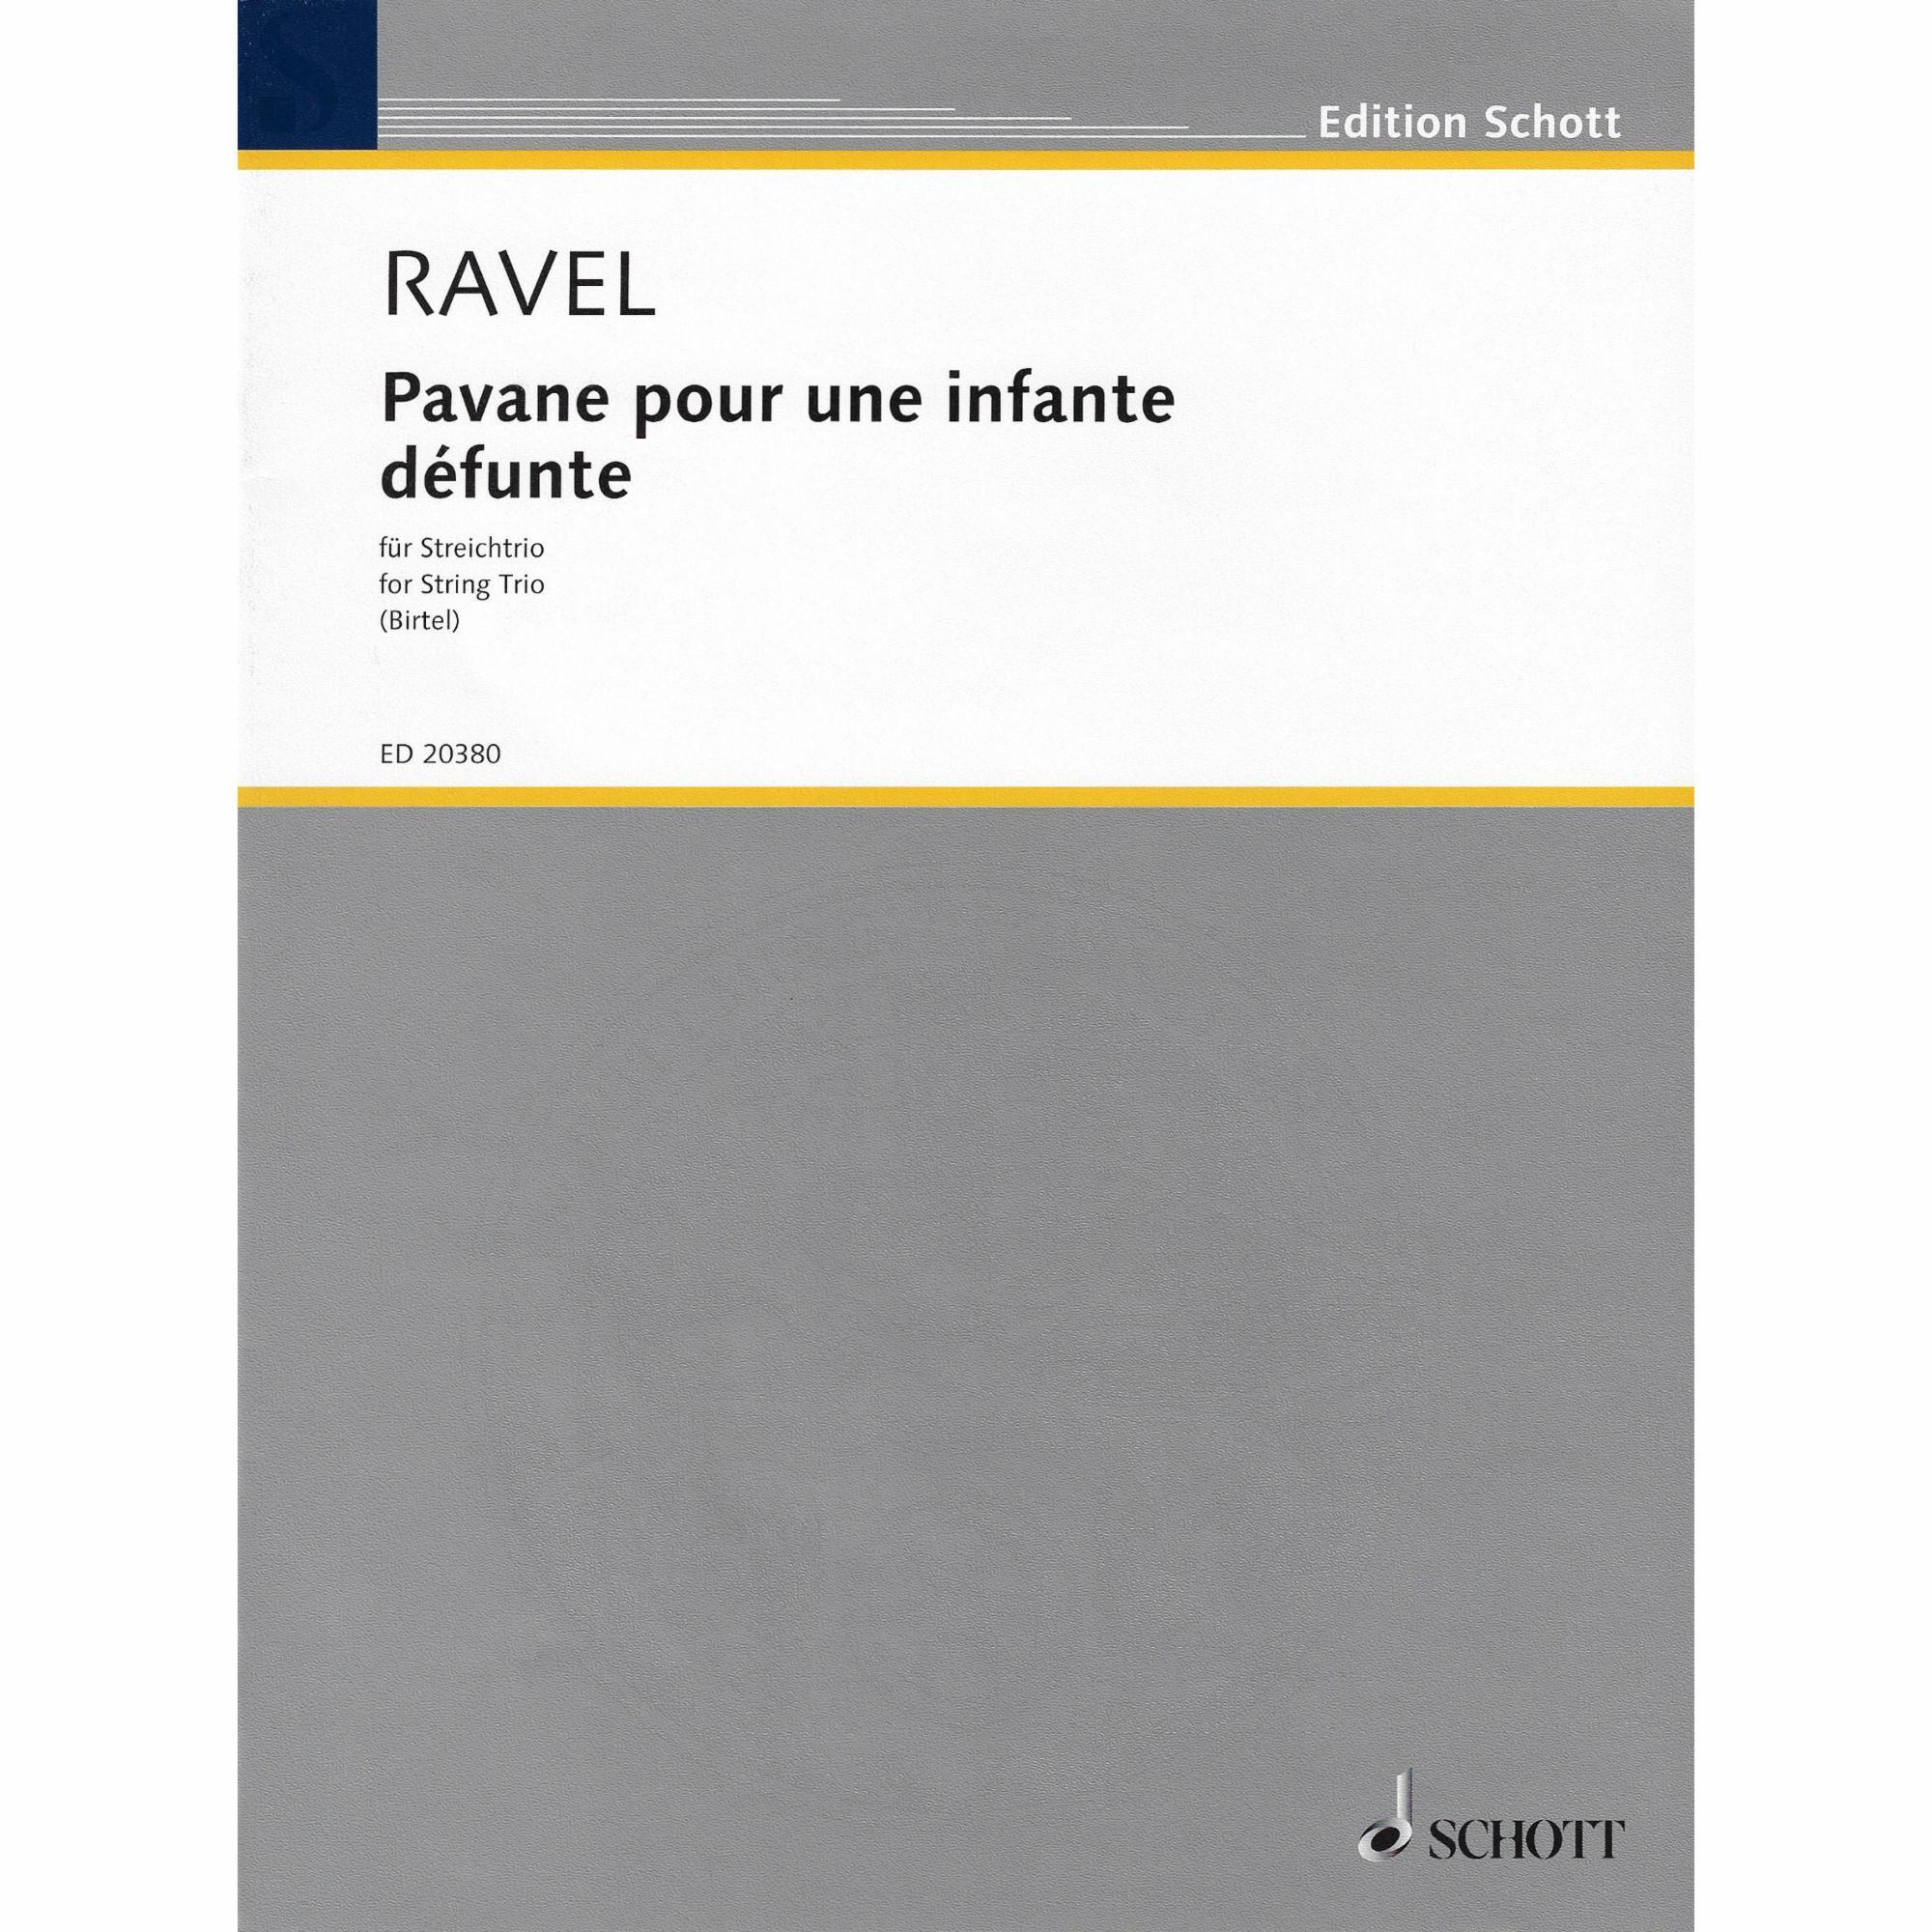 Pavane pour une infante defunte for String Trio